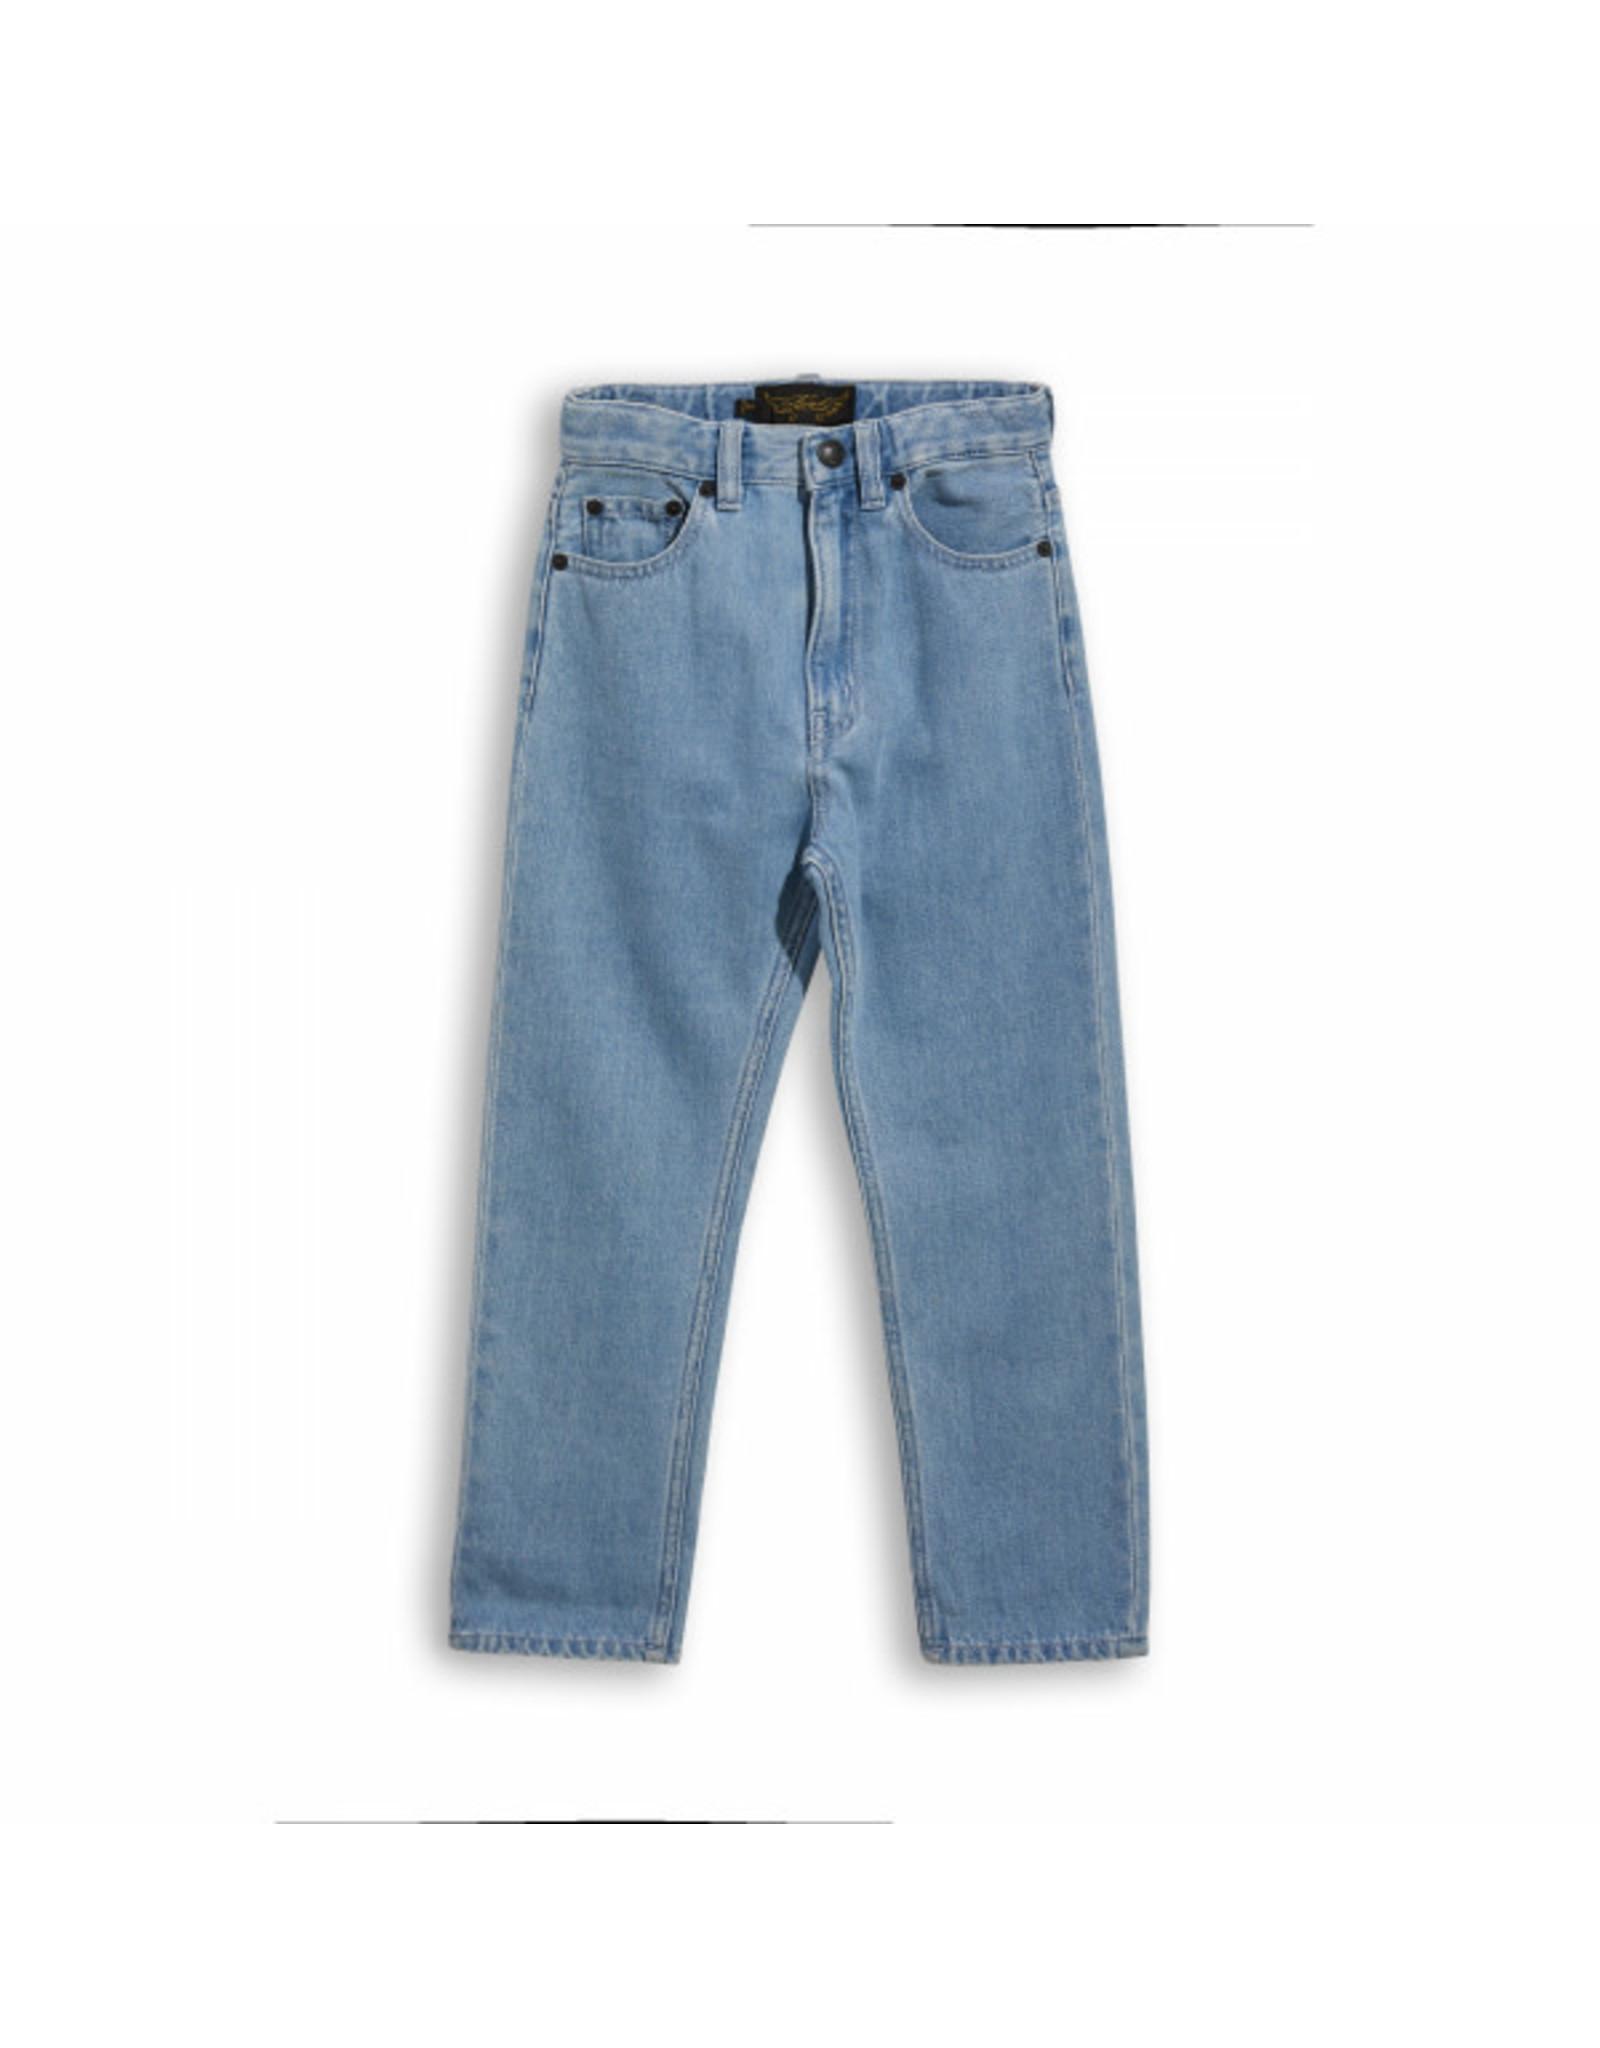 FITN Ollibis 5pckts jeans